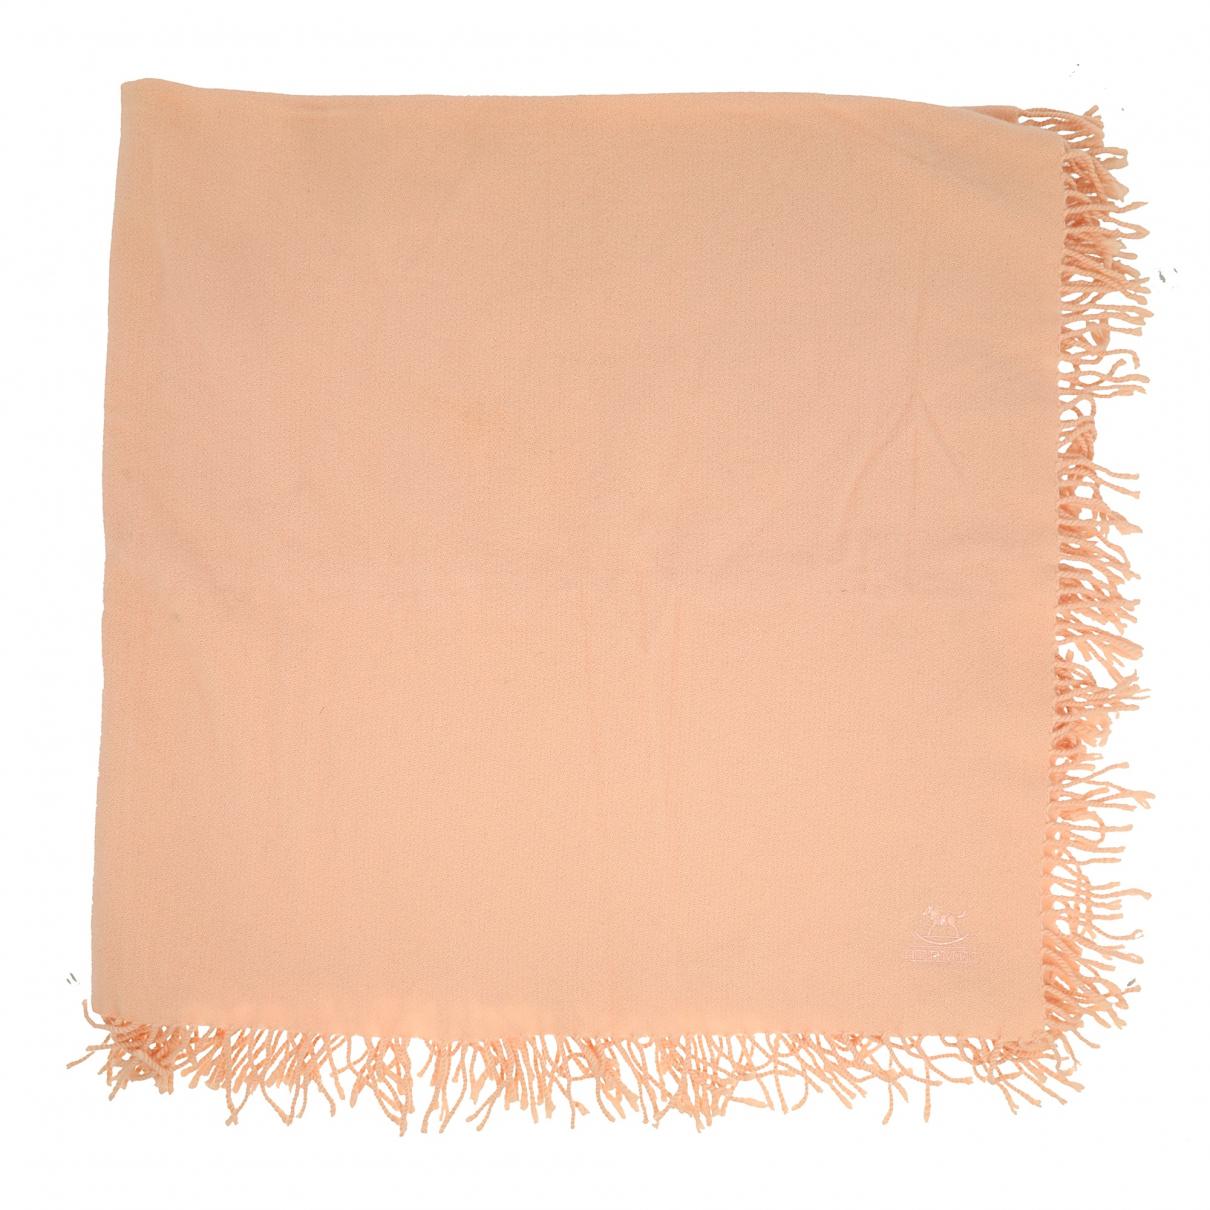 Hermes - Foulard   pour femme en cachemire - rose